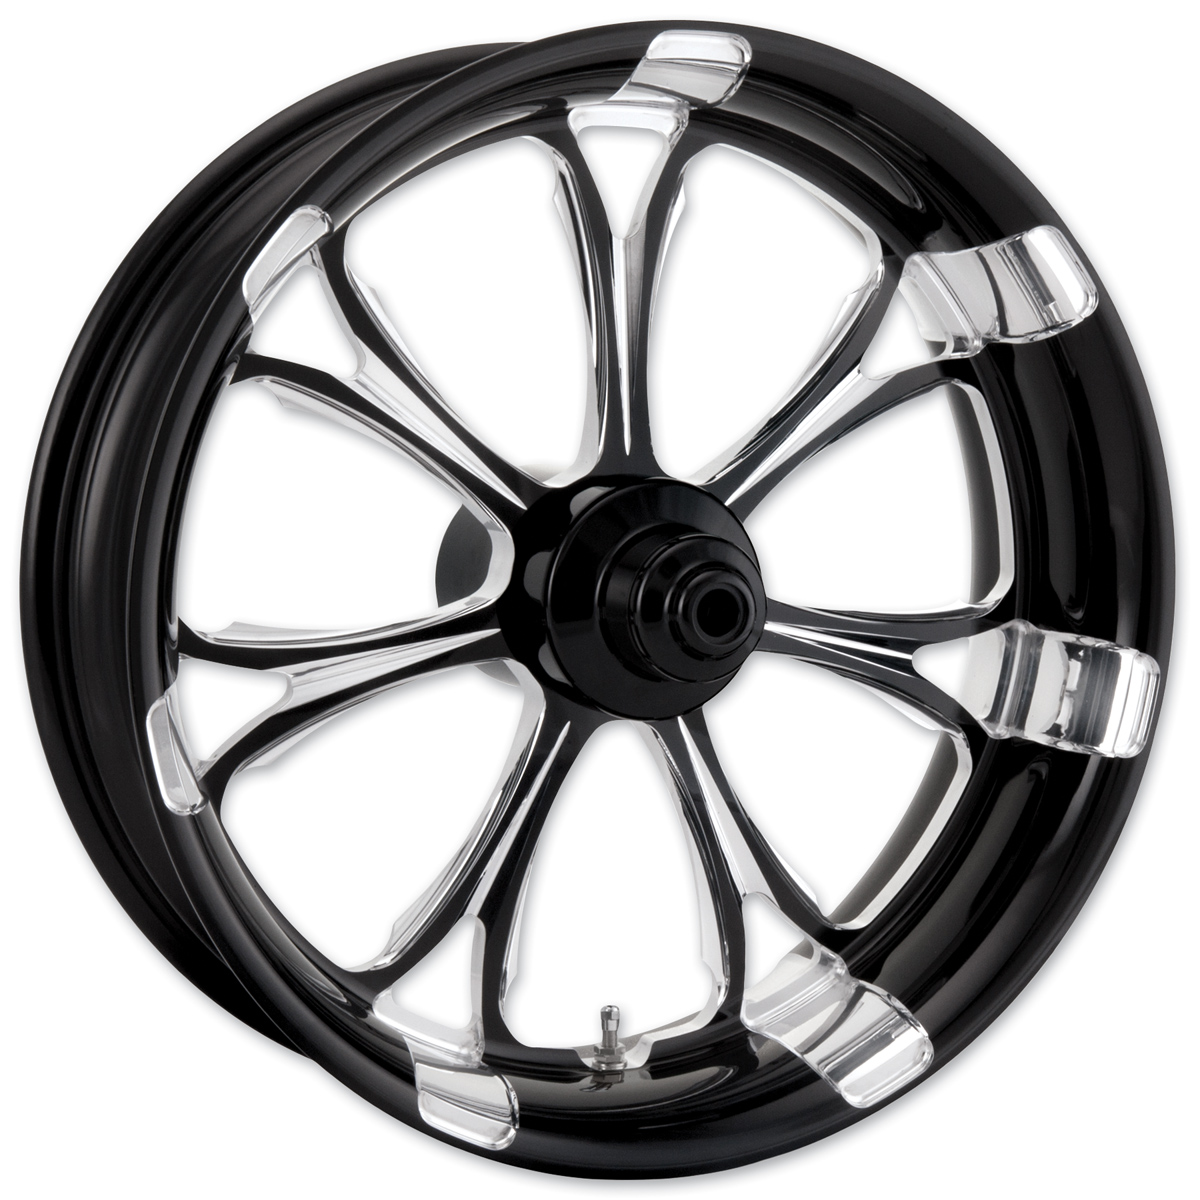 Performance Machine Paramount Chrome Rear Wheel 18x4.25 ABS